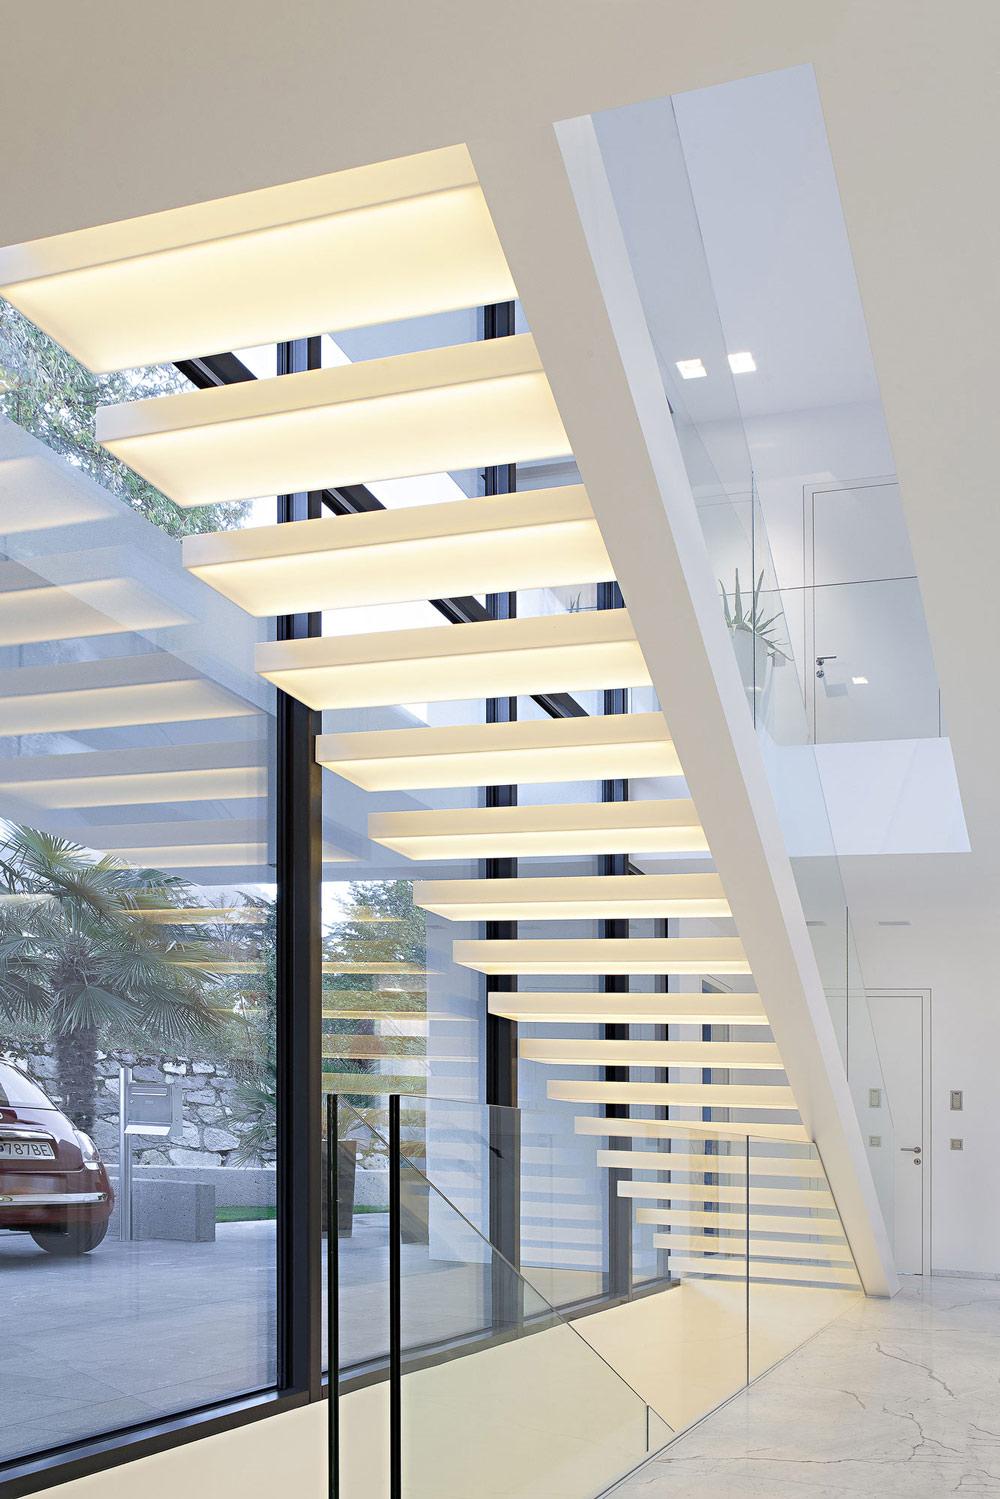 House-M-Meran-Italy-Stairs-Lighting